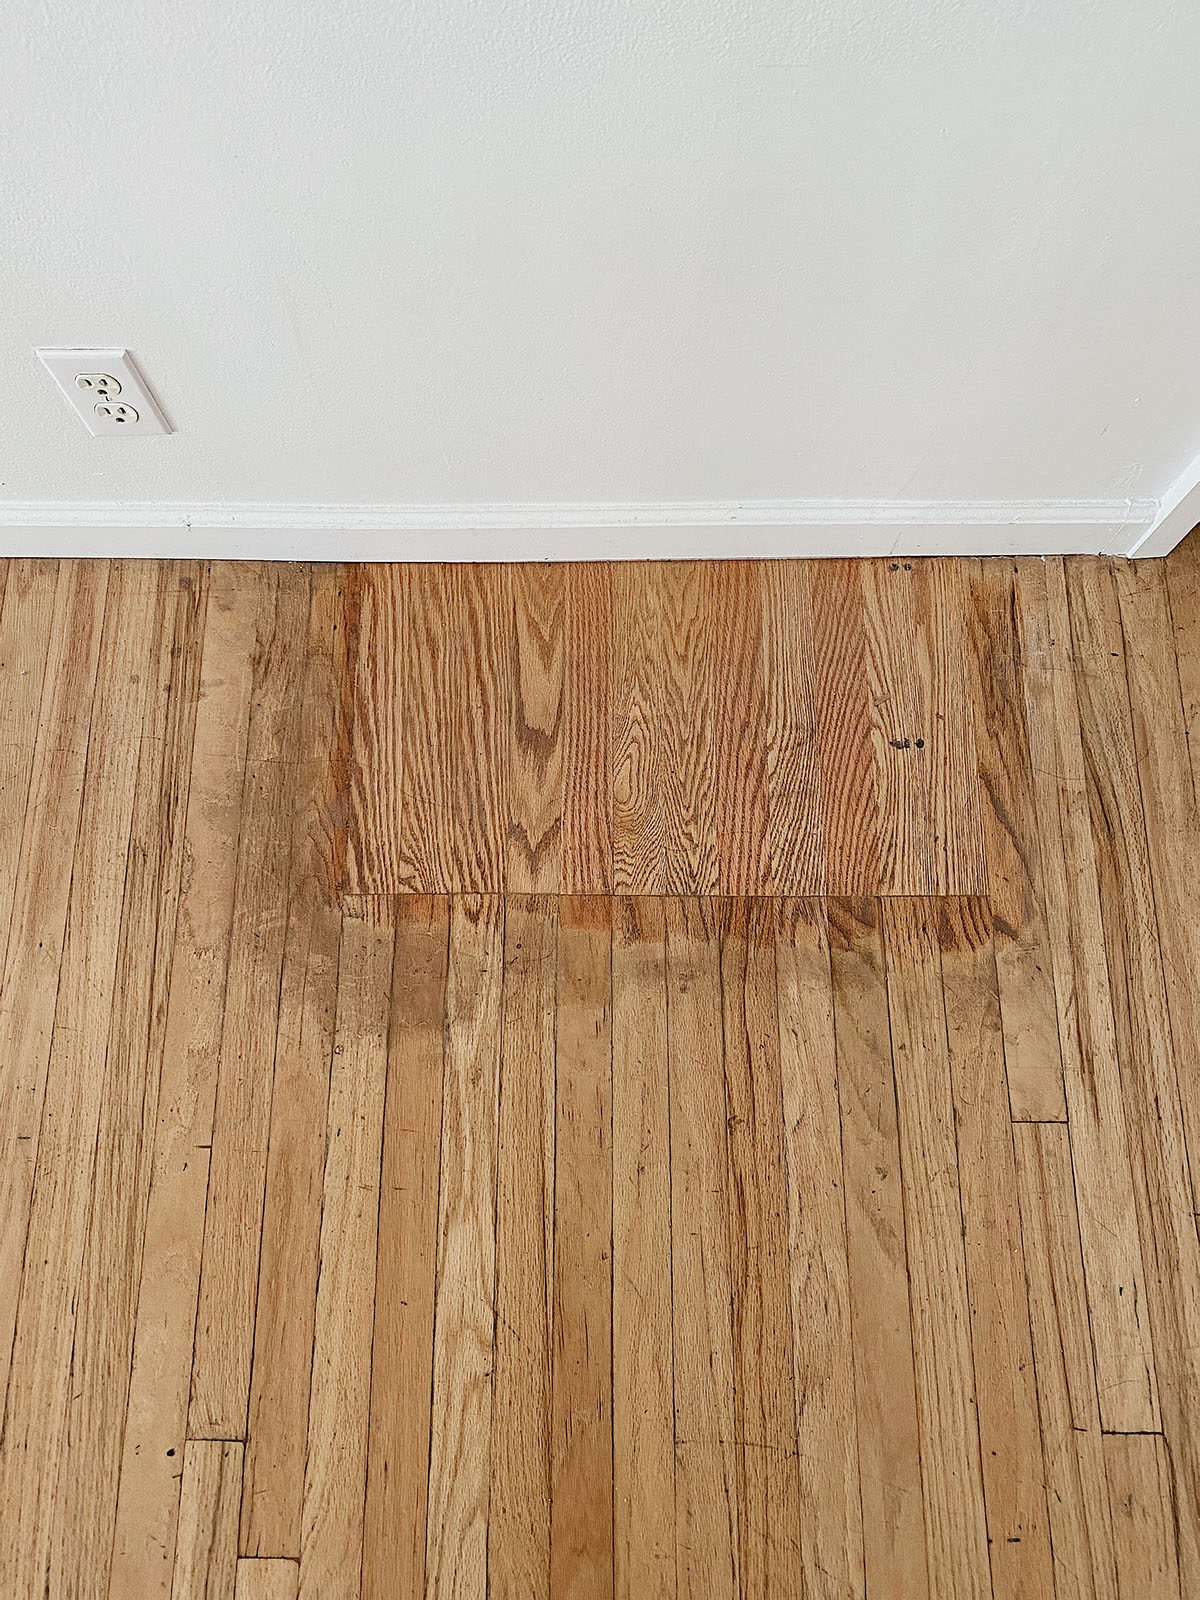 Our White Oak Engineered Hardwood Floors   Homey Oh My